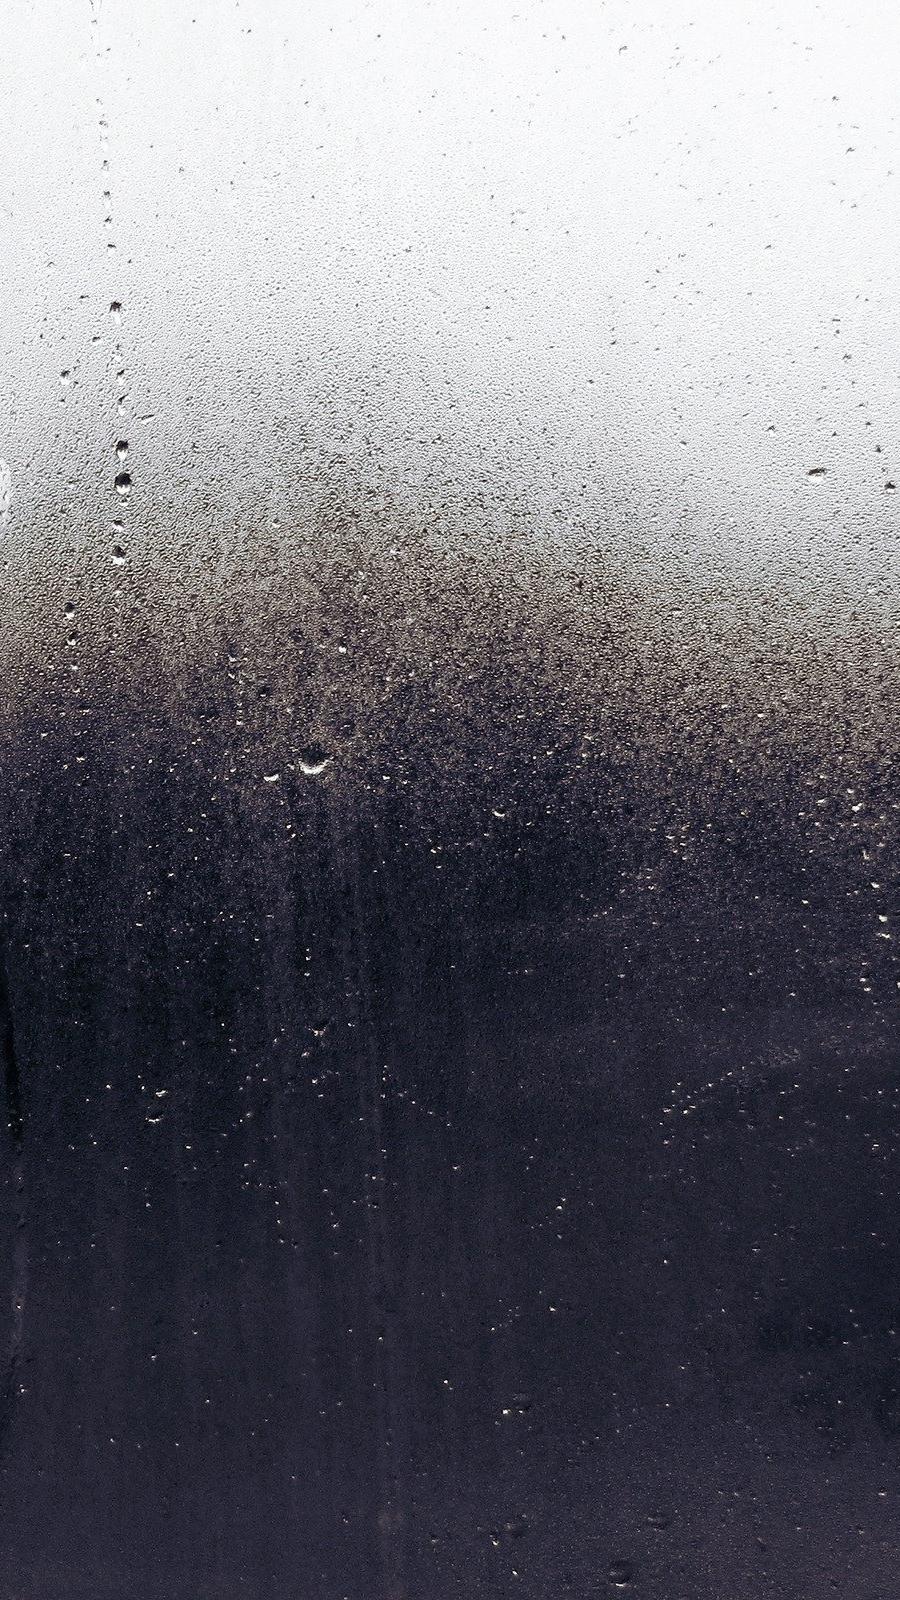 Glass Water Macro Iphone Wallpaper Iphone Wallpapers